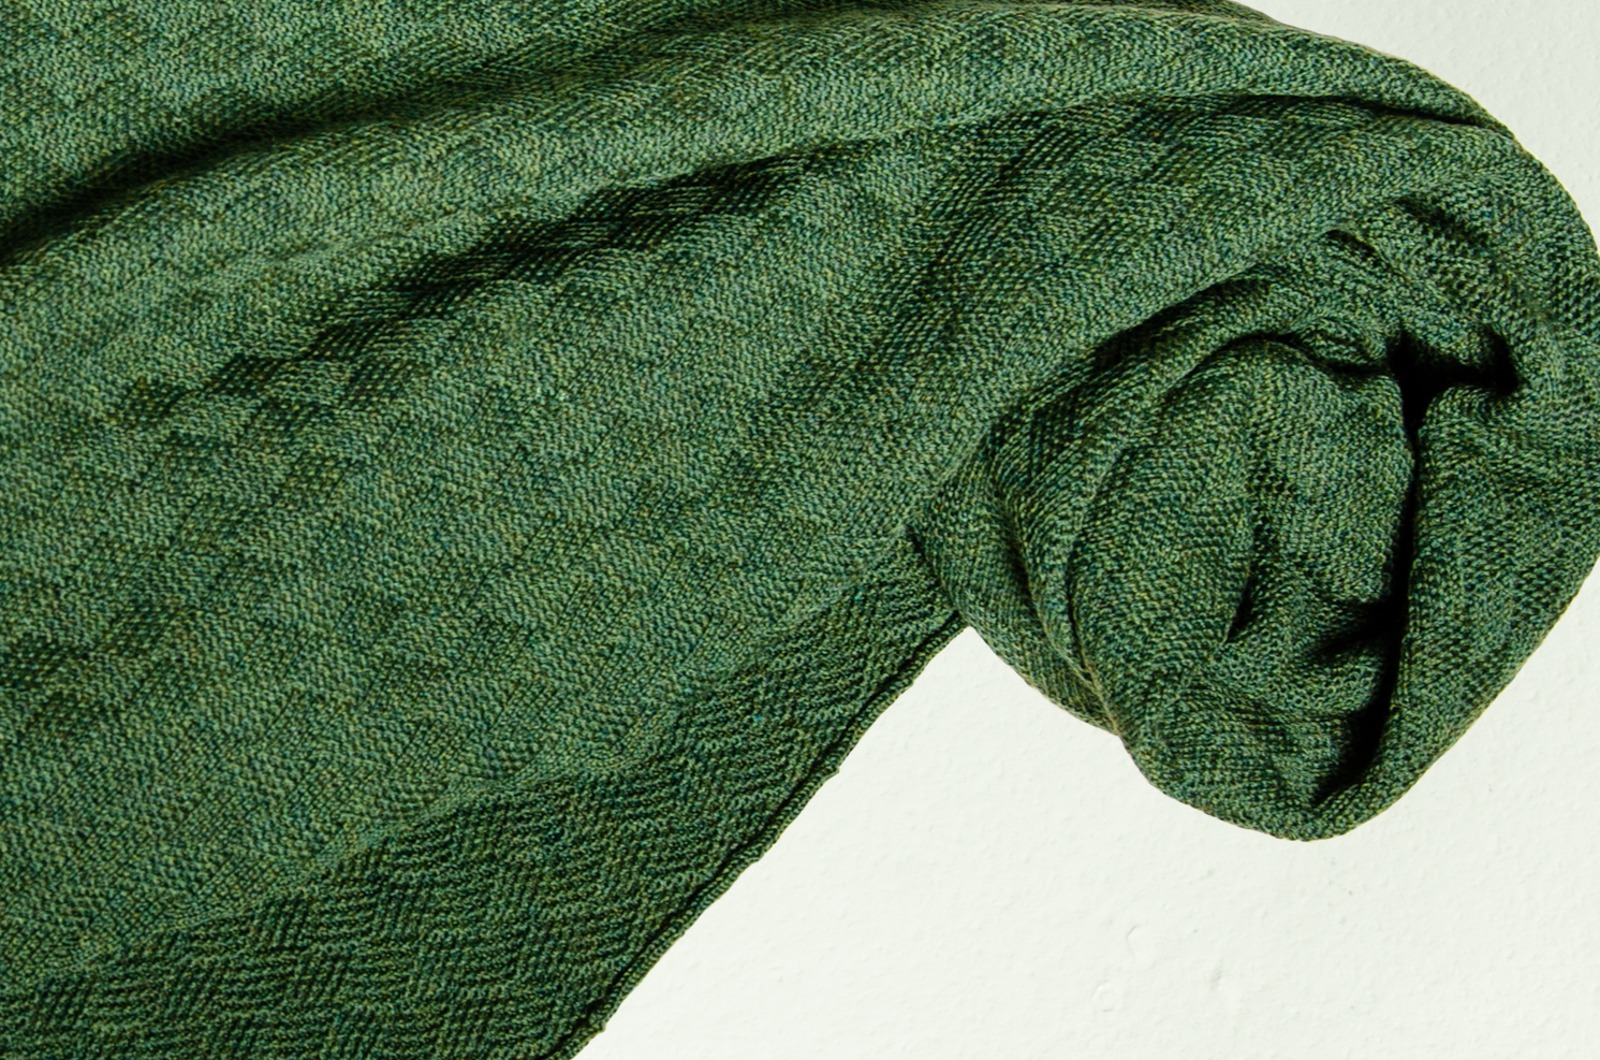 Merino Schal Weboptik einfarbig in dunkelgrün